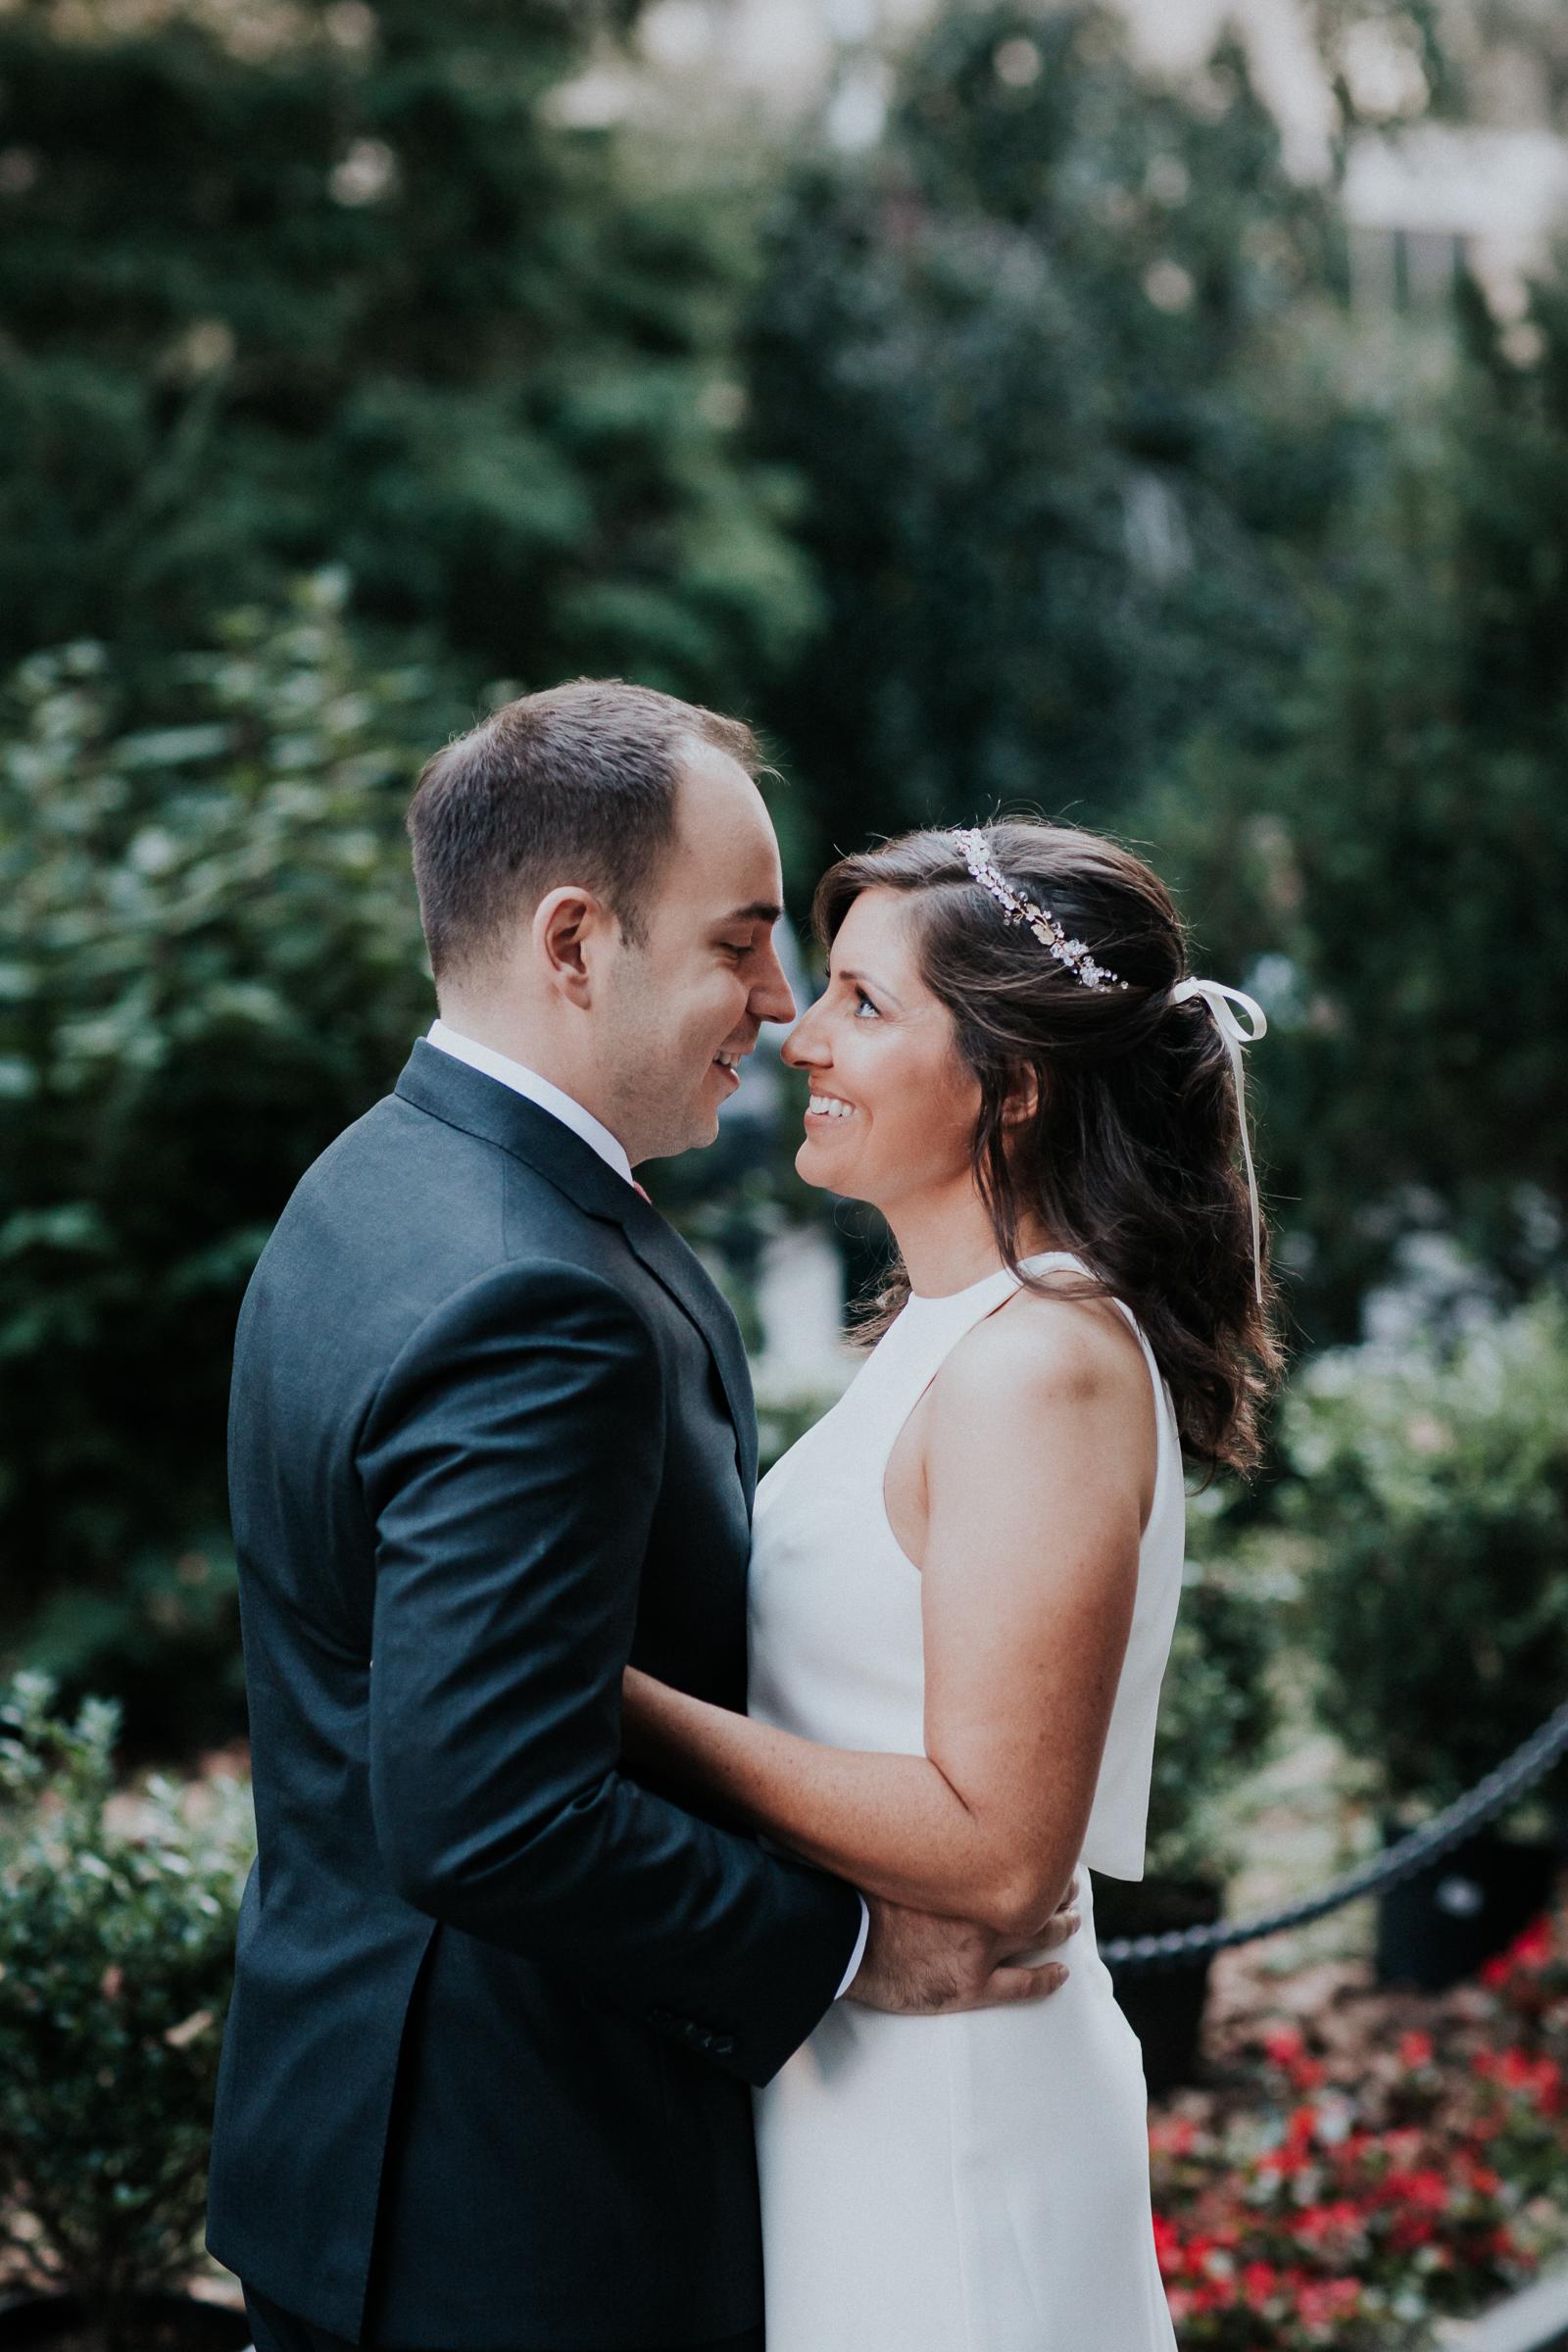 Casa-Apicii-Intimate-Wedding-City-Hall-Elopement-New-York-Documentary-Wedding-Photographer-28.jpg